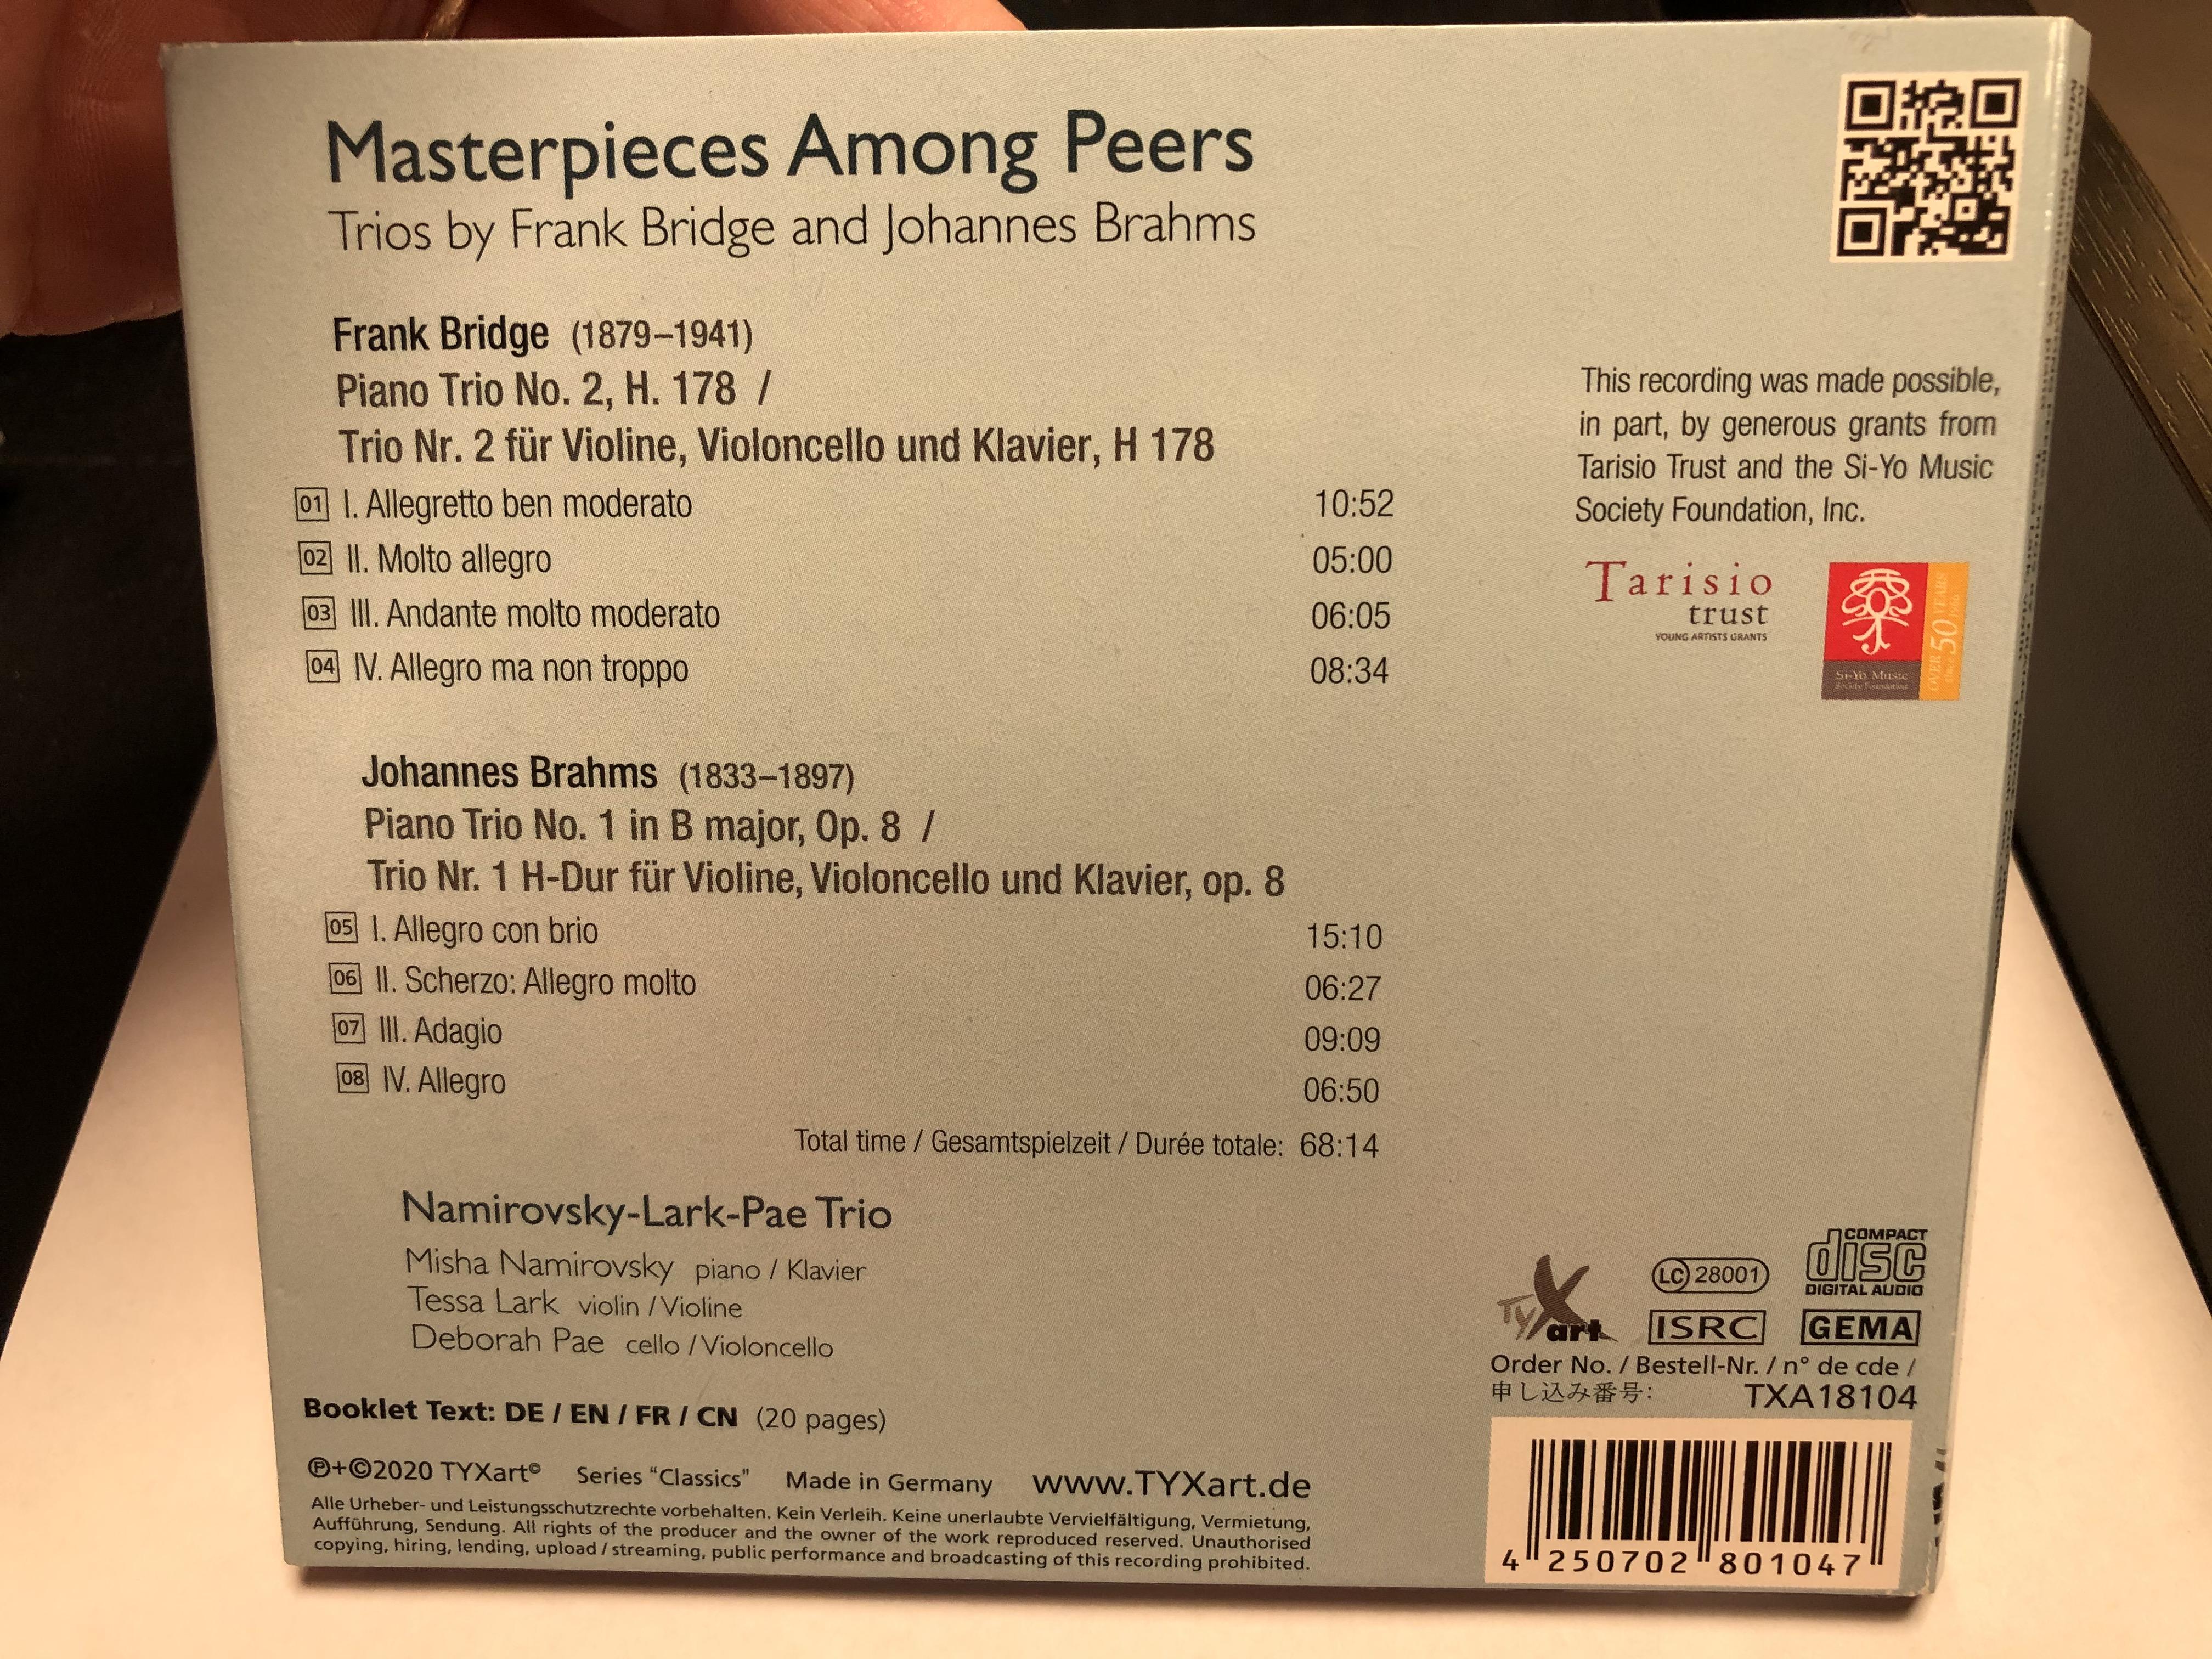 materpieces-among-peers-trios-by-frank-bridge-and-johannes-brahms-namirovsky-lark-pae-trio-tyxart-audio-cd-2020-txa18104-2-.jpg